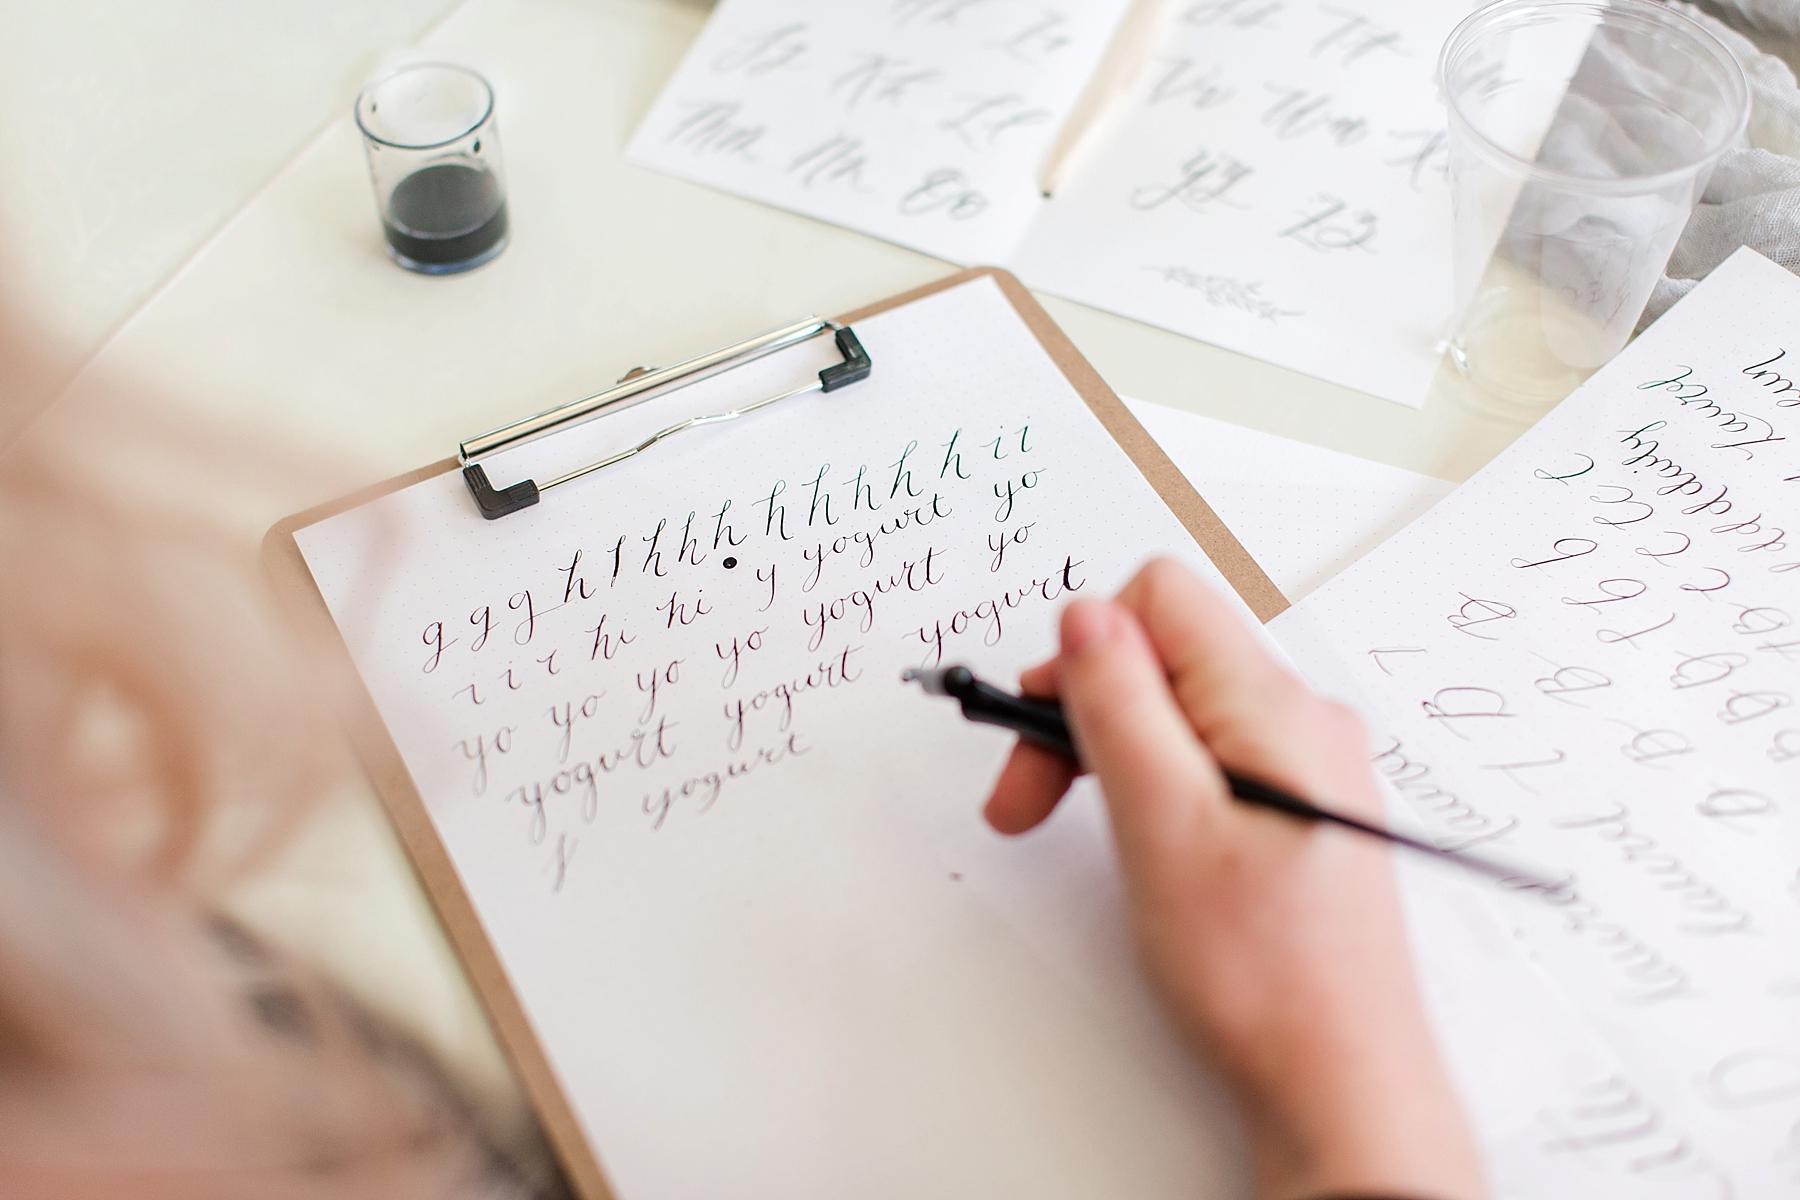 seattle-calligraphy-workshop_0008.jpg